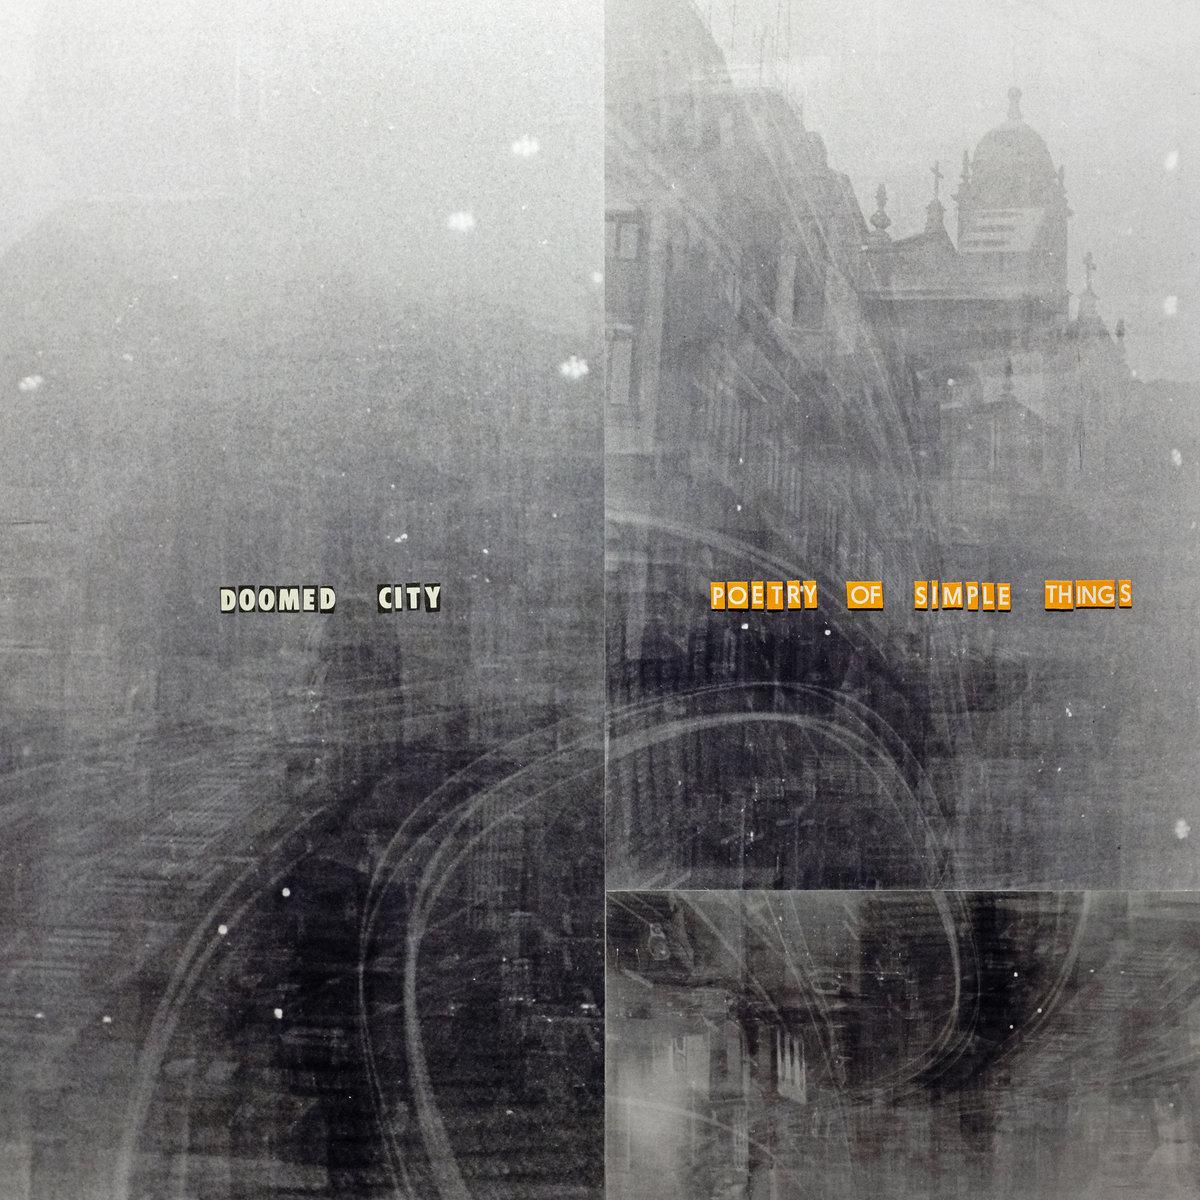 doomed city poetry of simple things